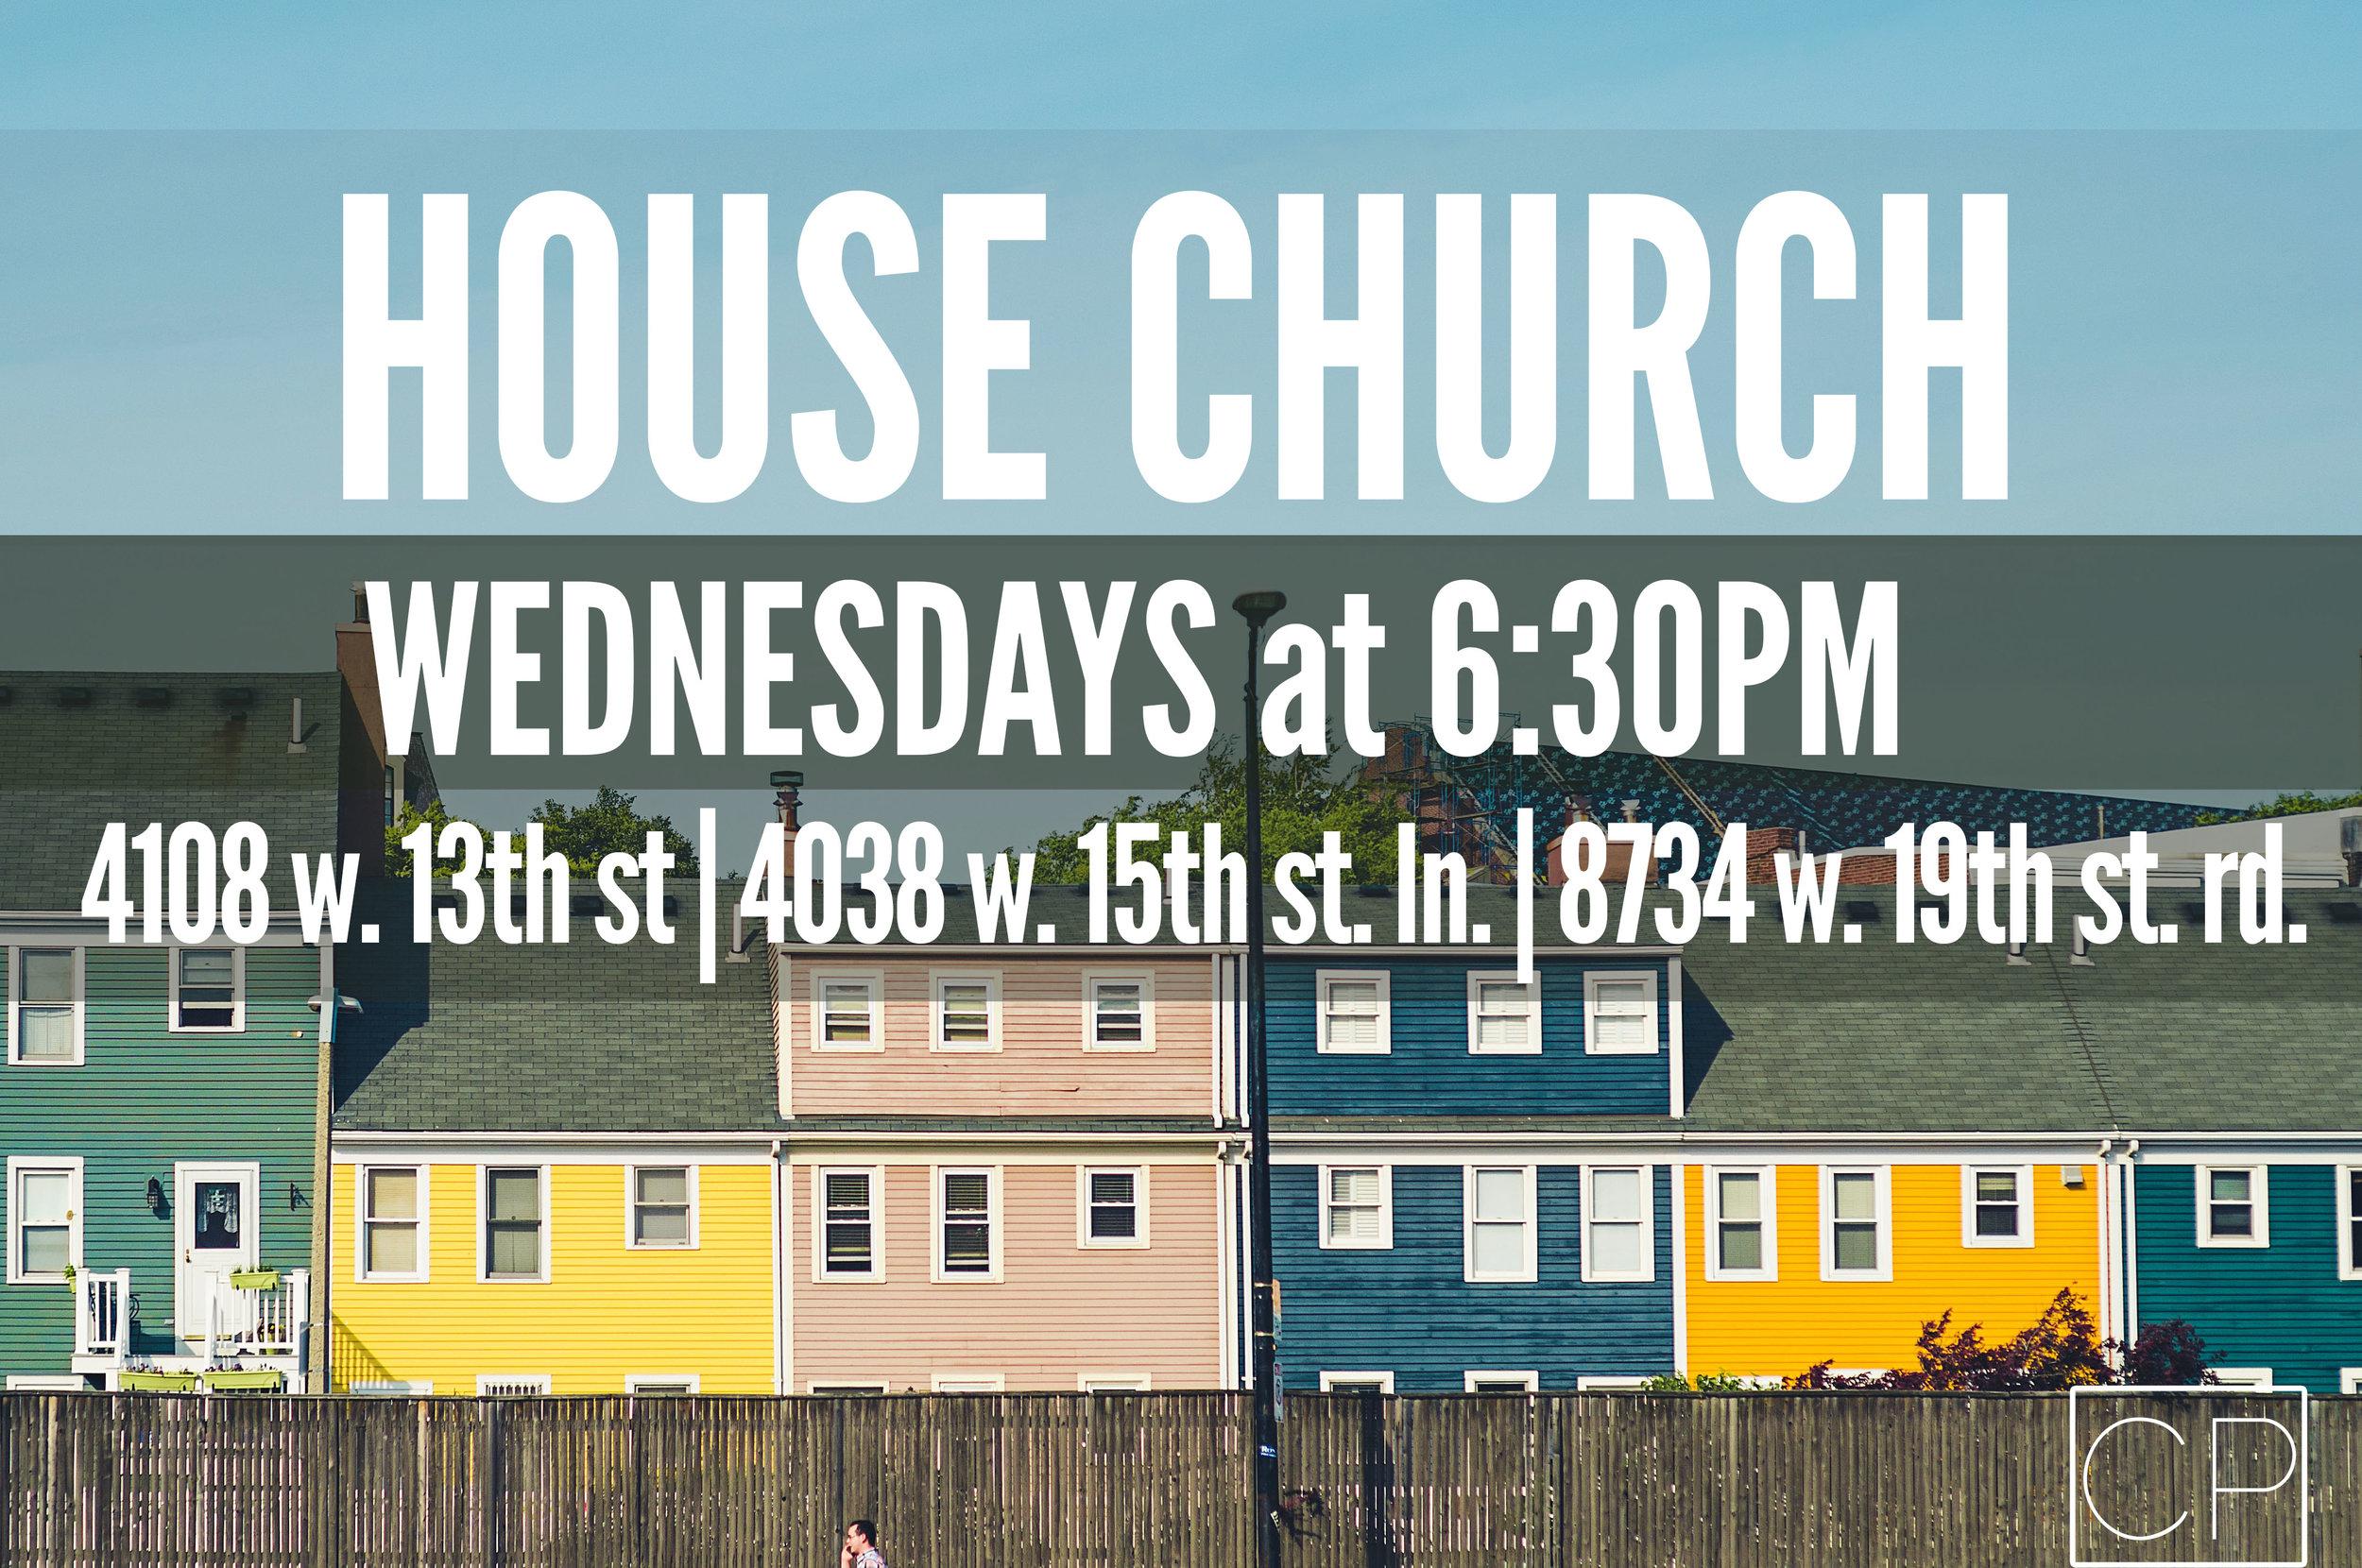 house churches 2018 wednesday.jpg